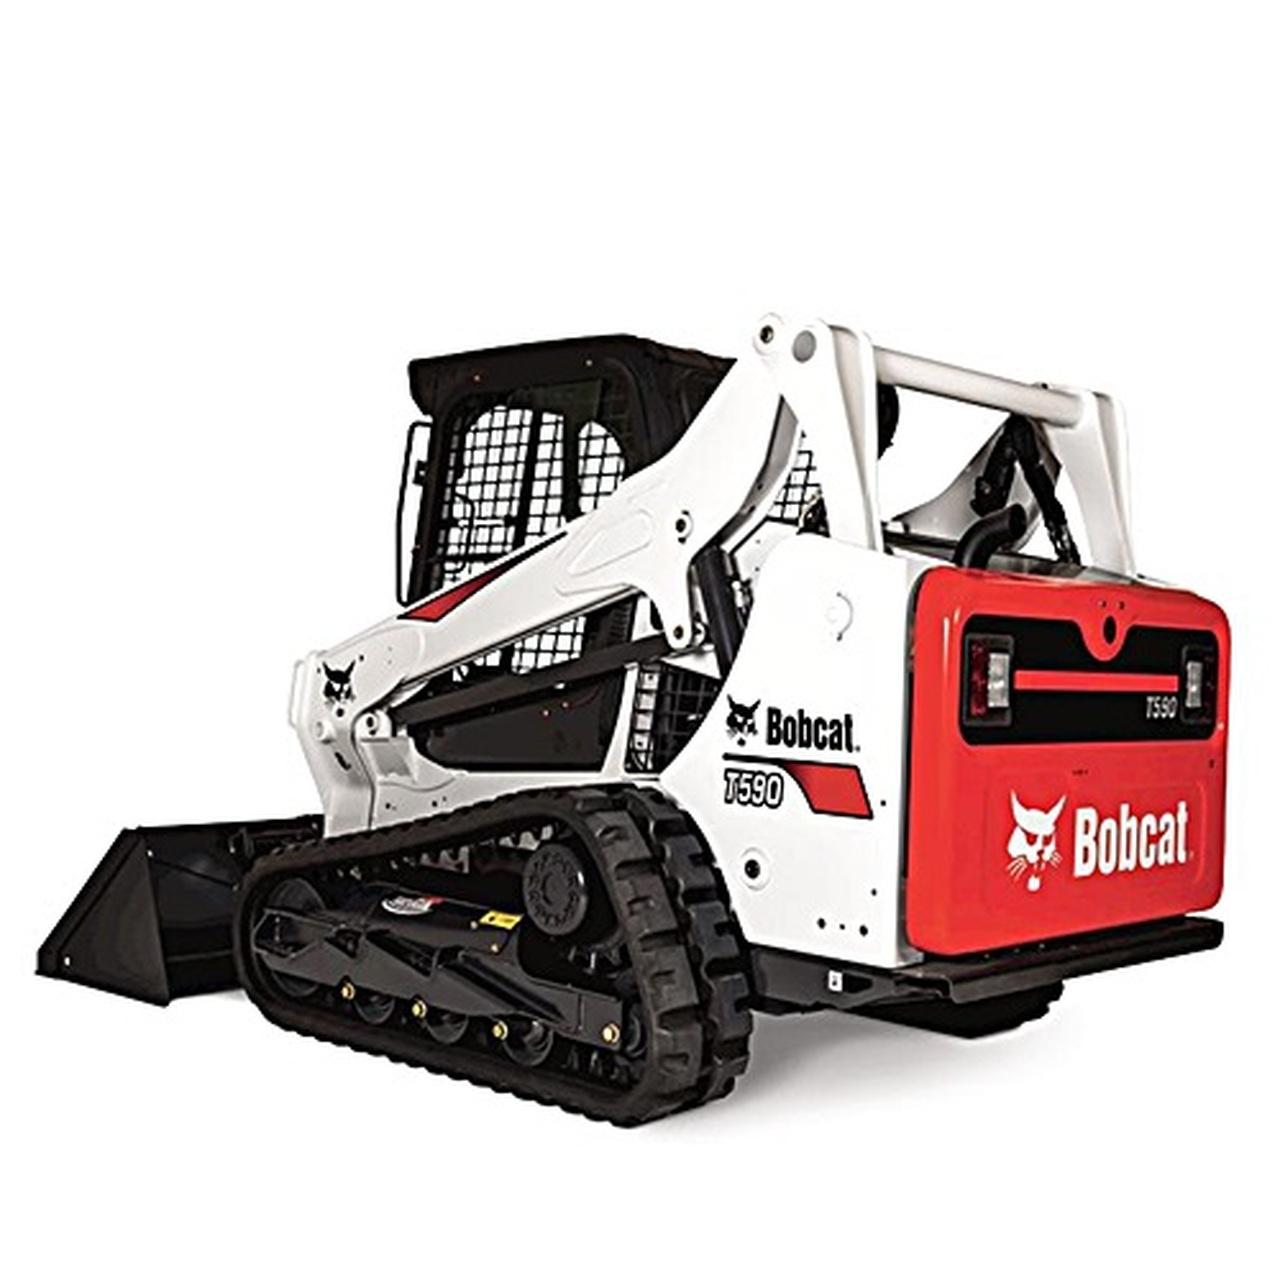 Bobcat T590 (66hp) $280/day $840/week $2520/month